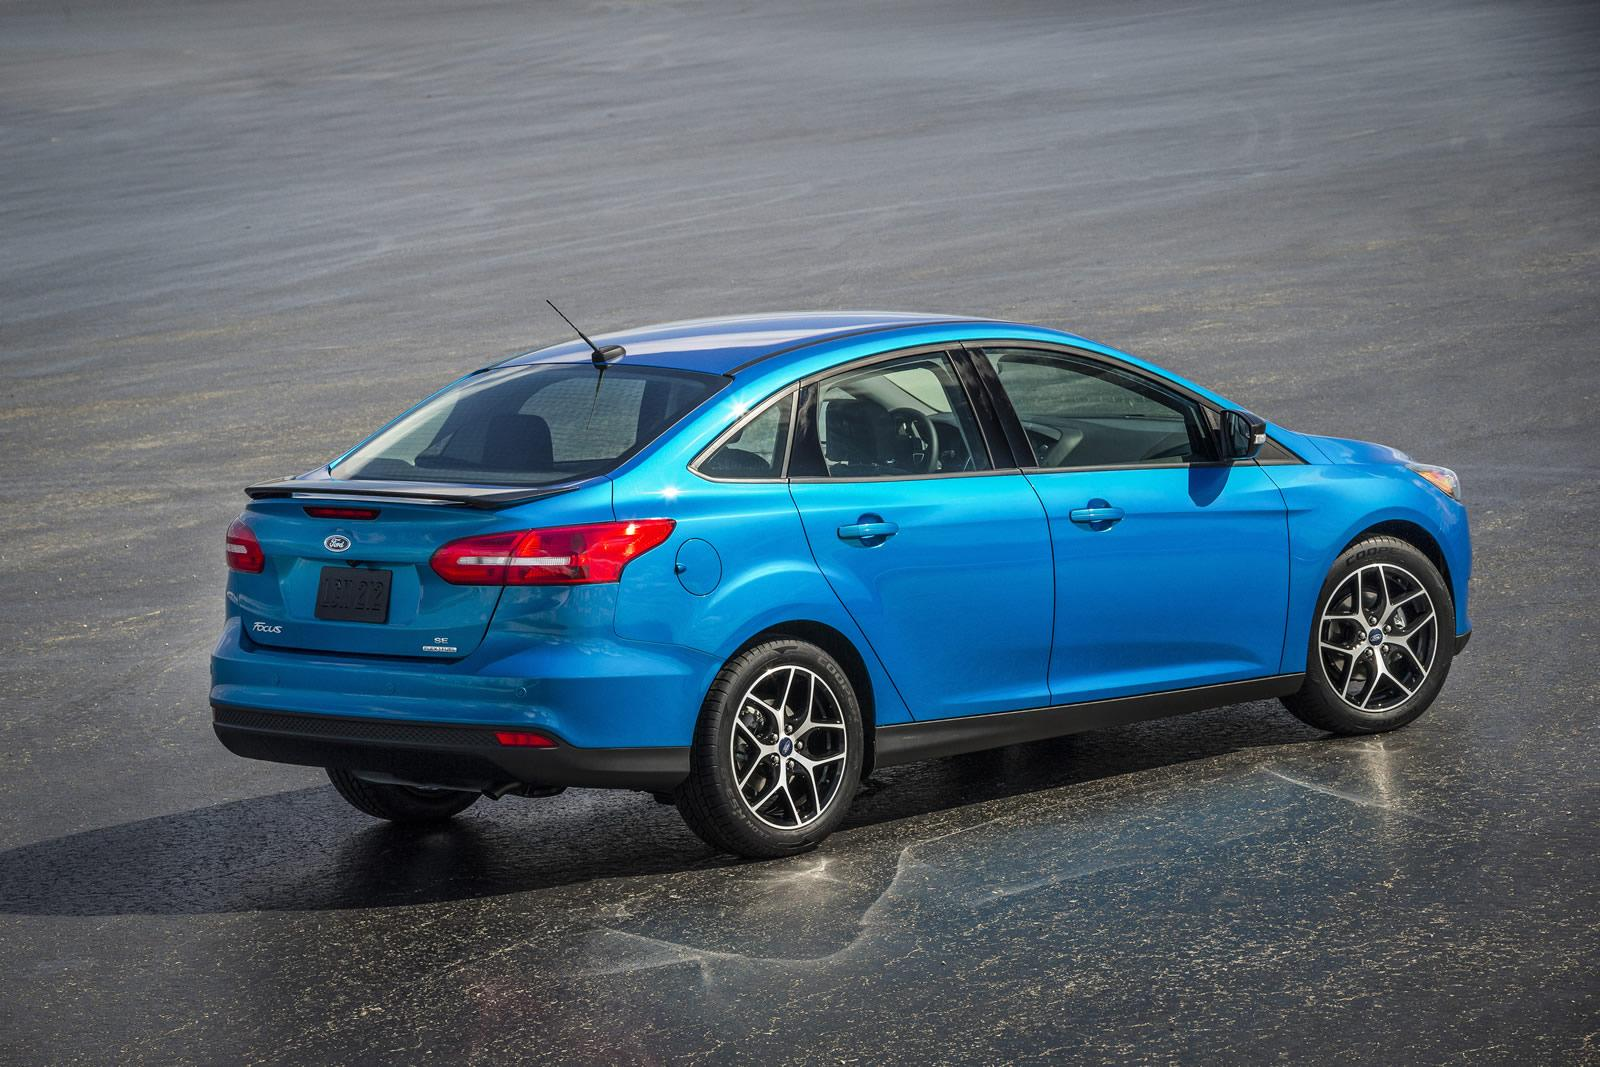 ford cars news revised 2015 ford focus sedan unveiled. Black Bedroom Furniture Sets. Home Design Ideas